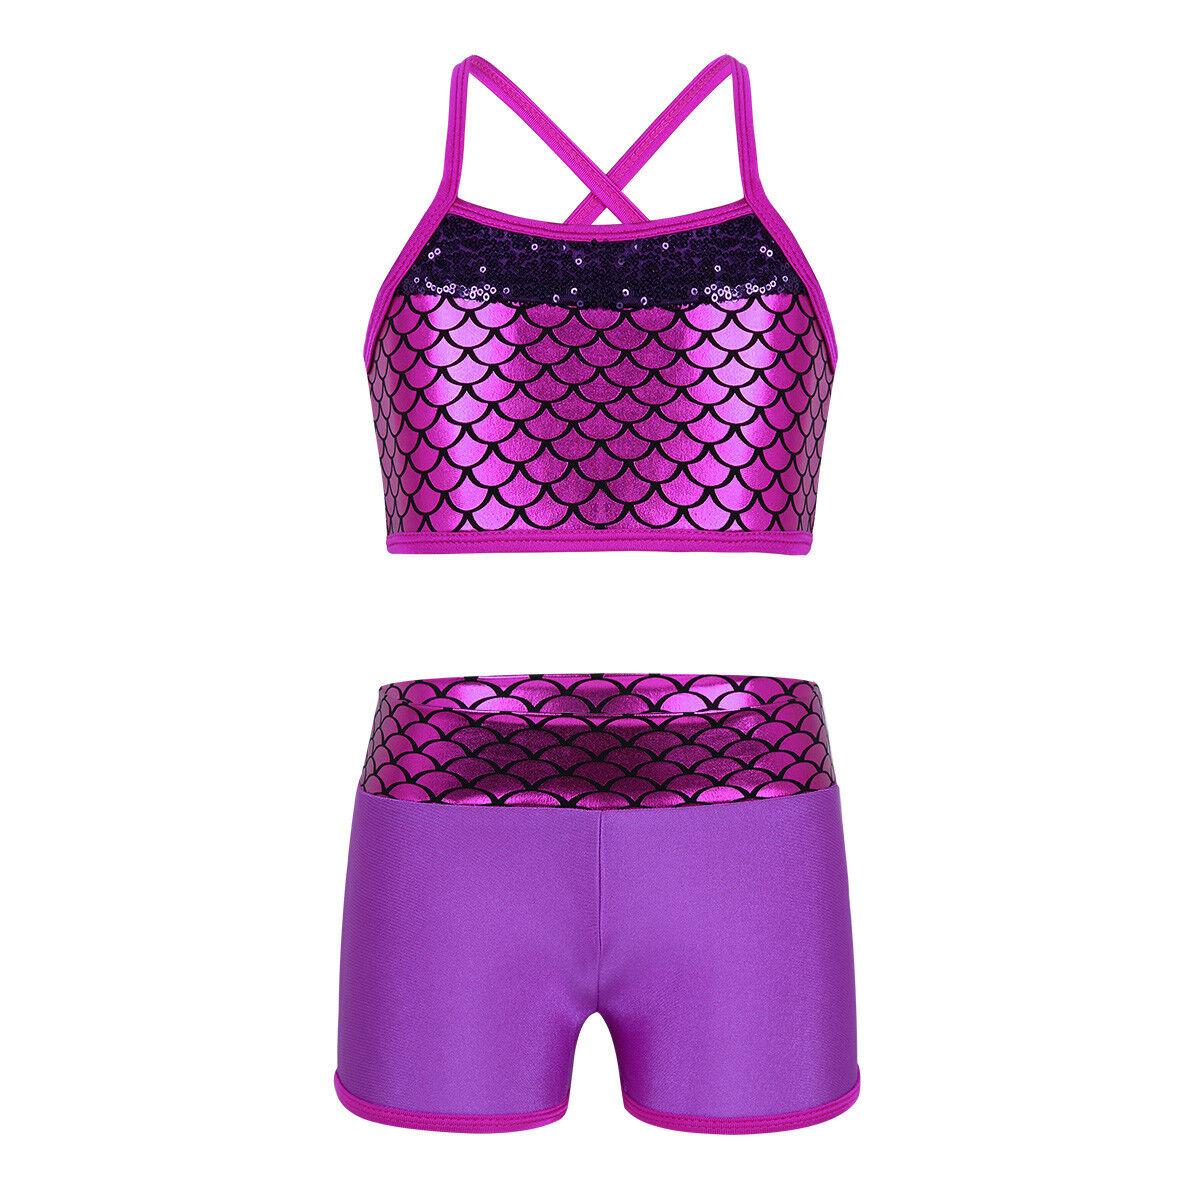 Girls Kids Sport Dance Outfit Crop Tops Shorts Gymnastics Leotards Dancewear